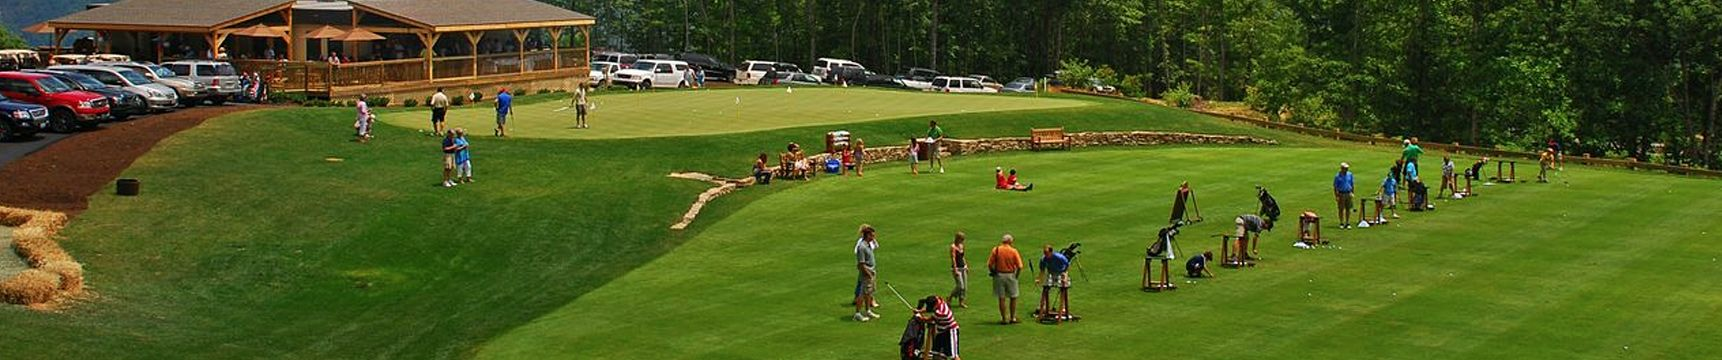 17++ Bear lake reserve golf club information